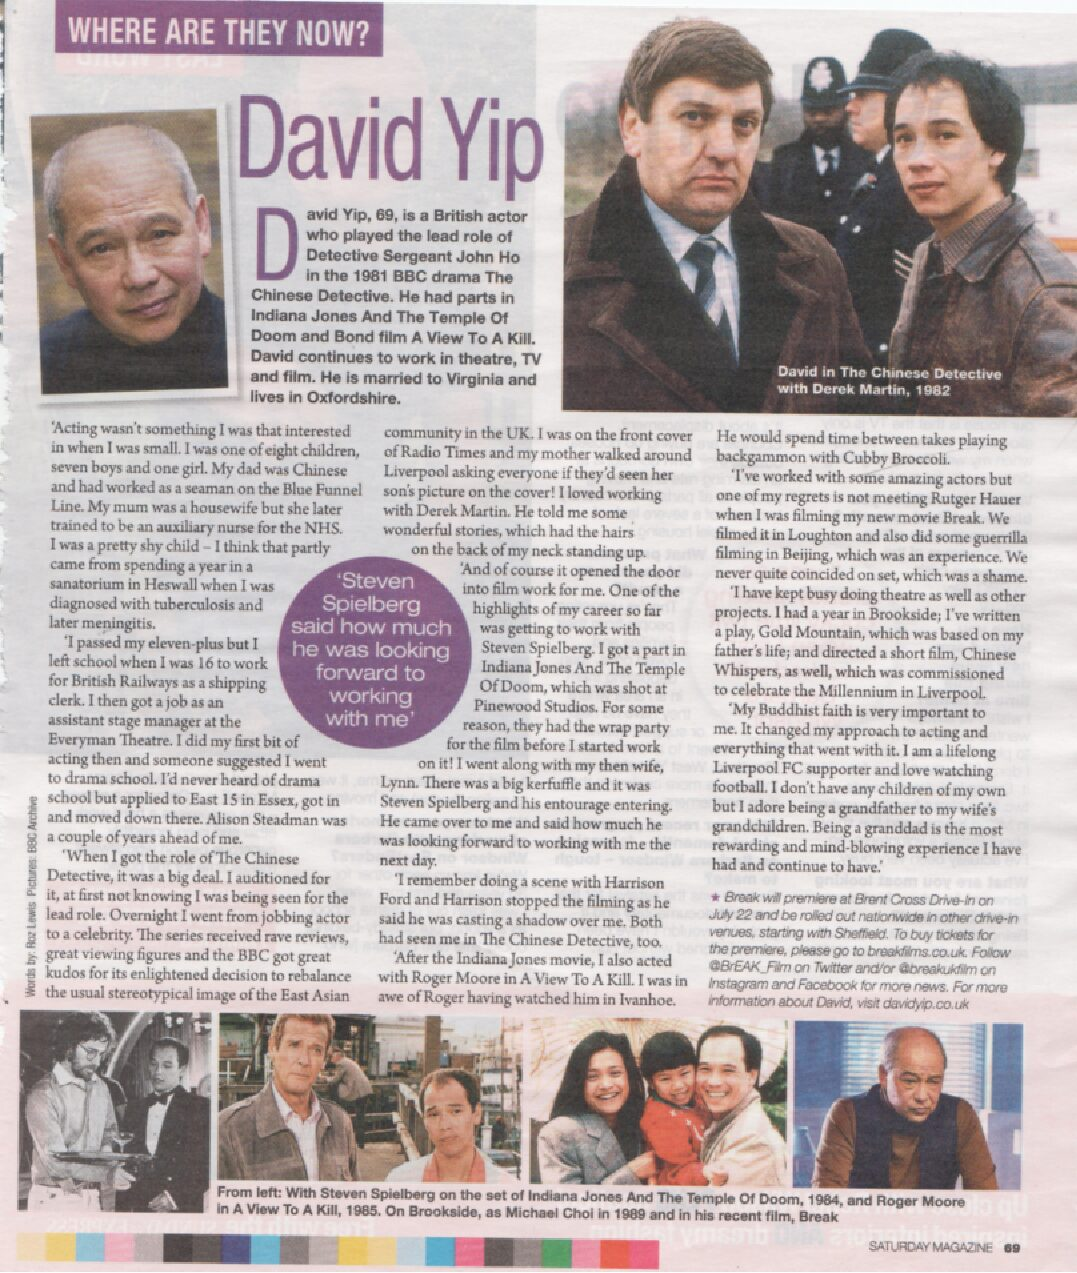 David Yip Article